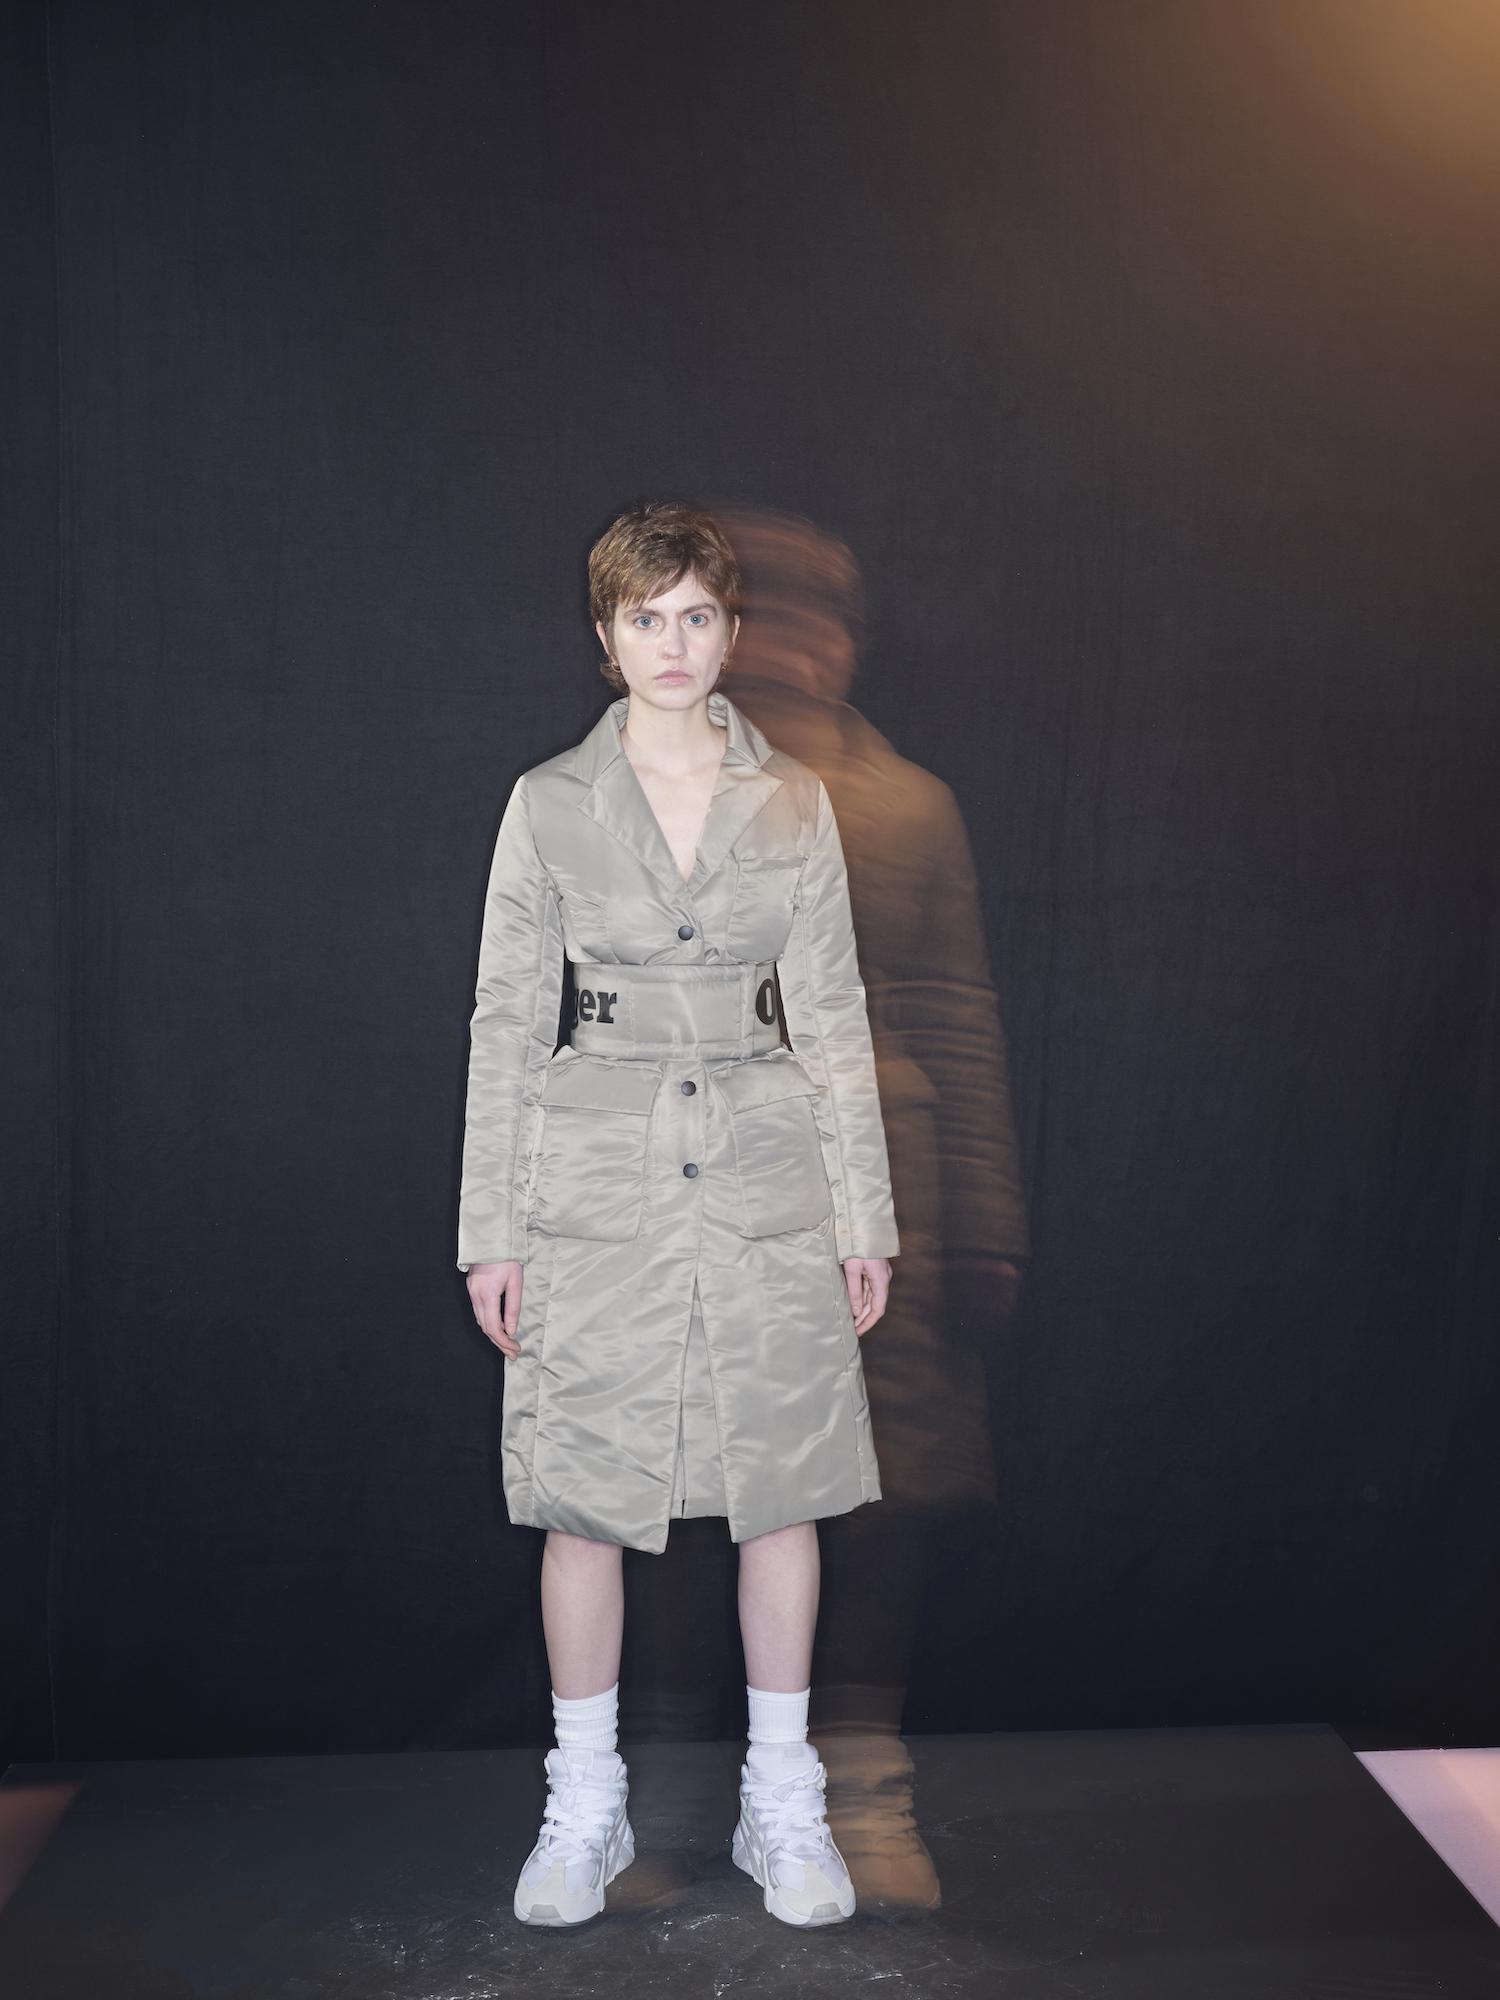 Onitsuka Tiger Autumn _ Winter 2021 collection_Milan Fashion Show_05.jpg